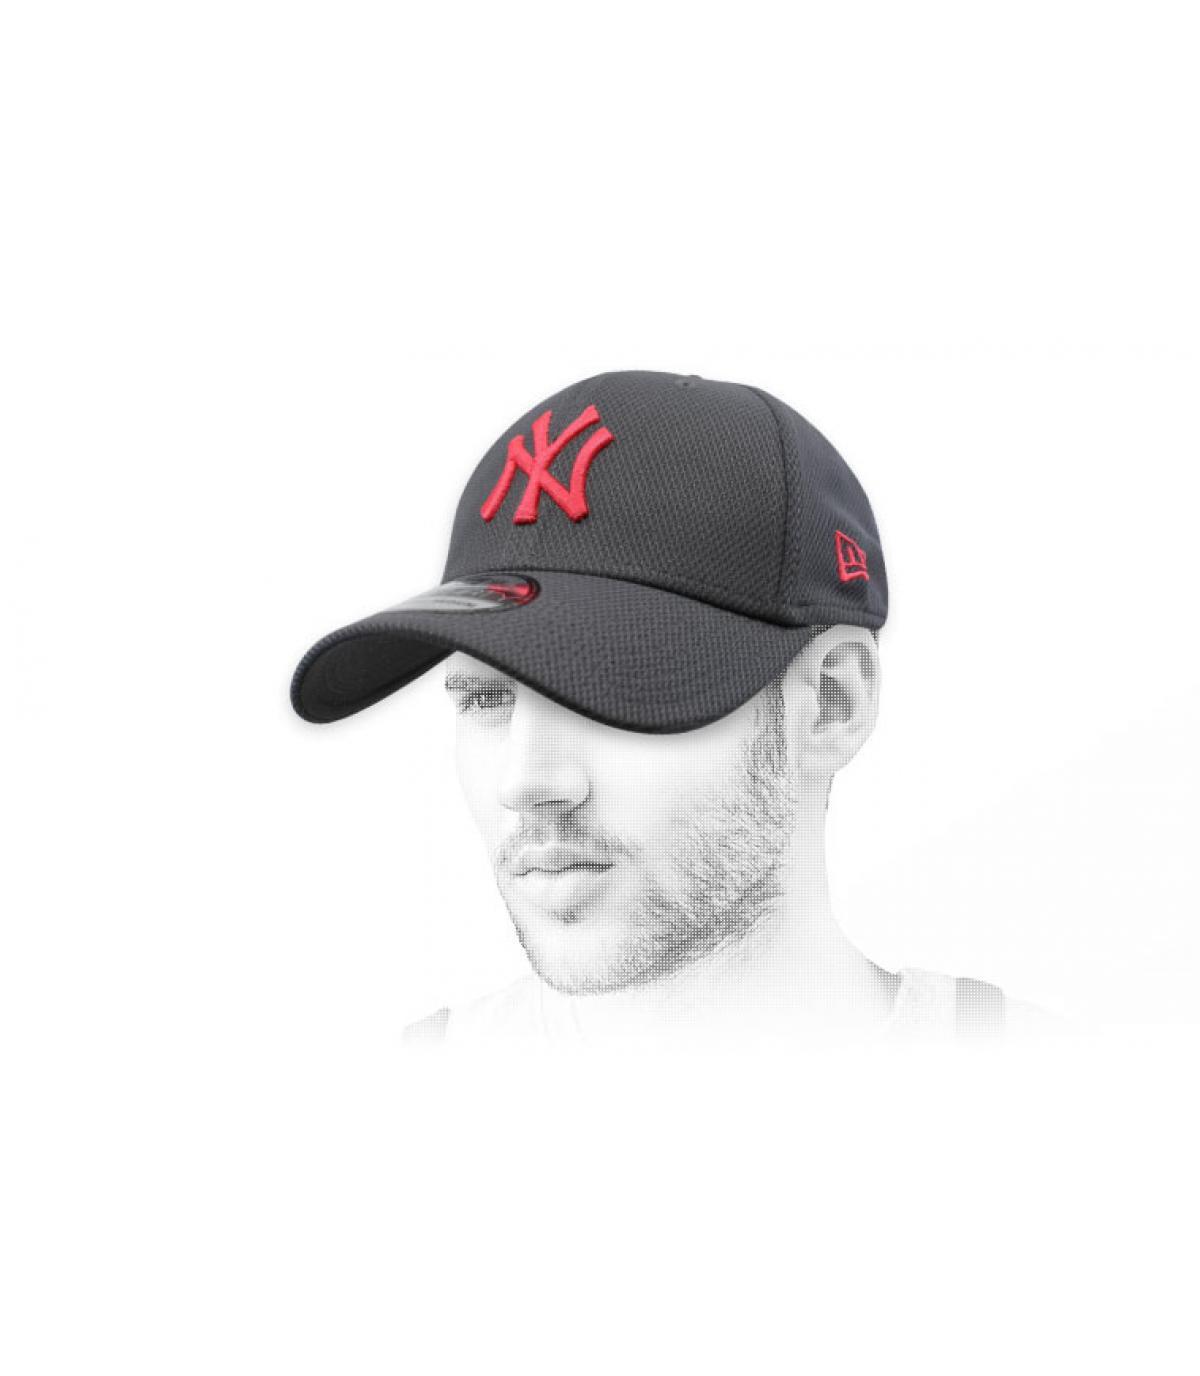 casquette NY gris rouge